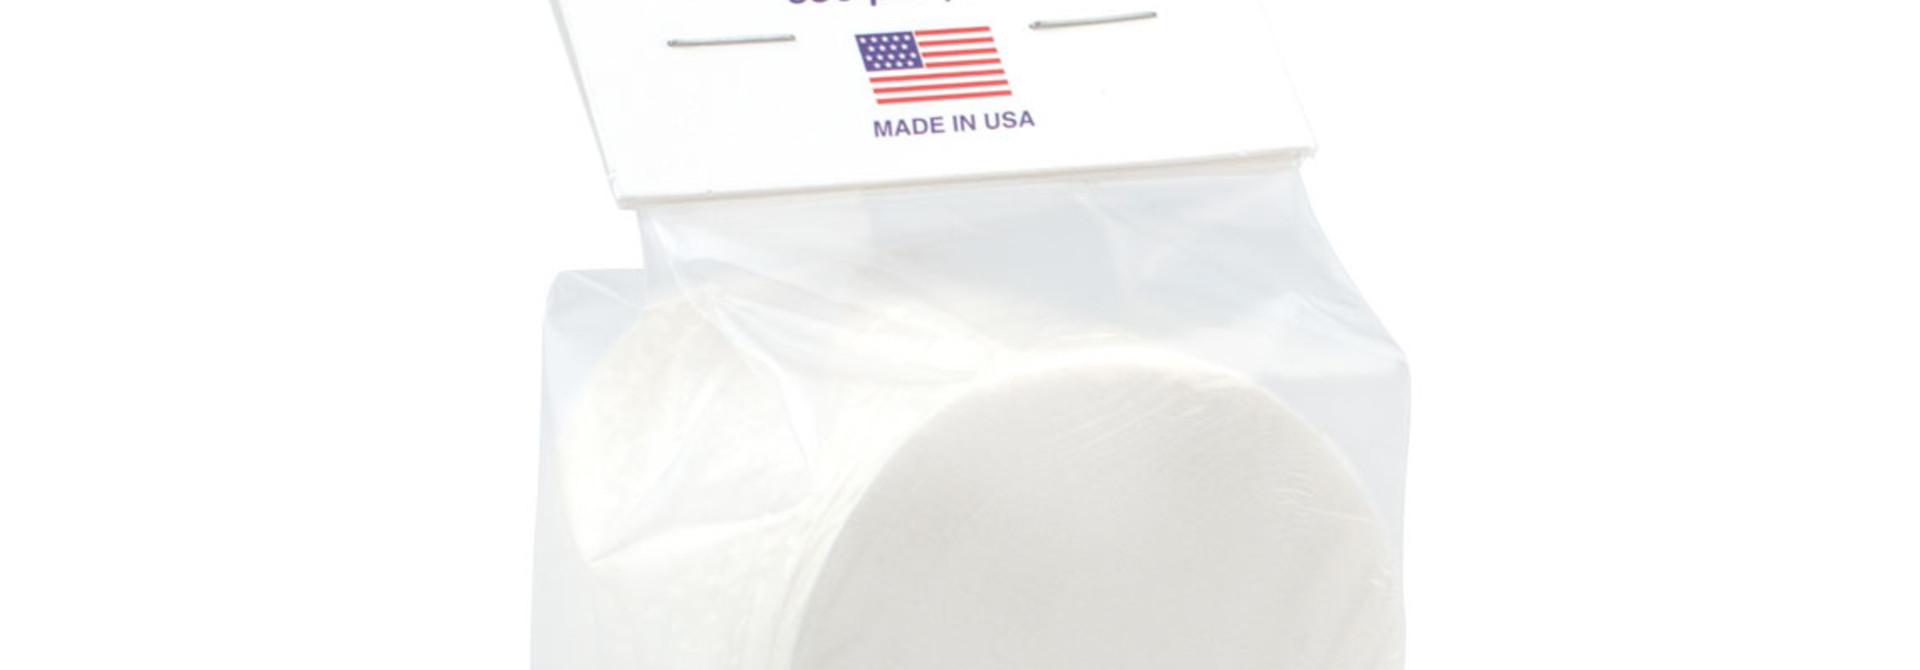 Aeropress microfilters